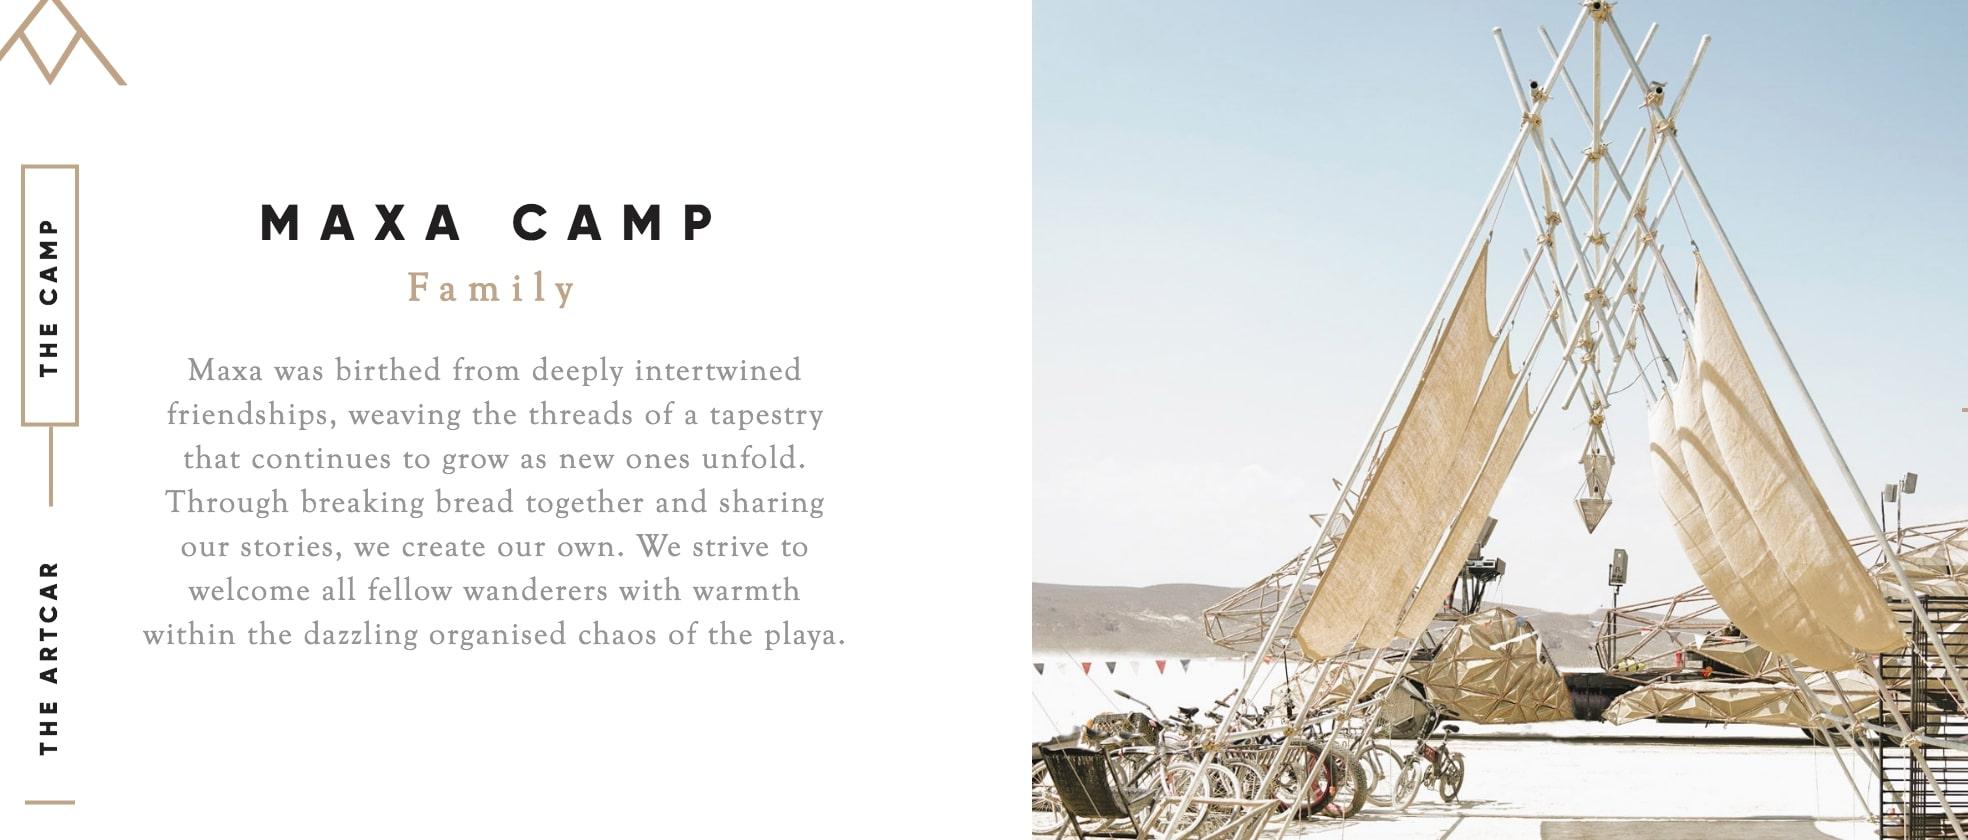 Maxa Camp Website Copy